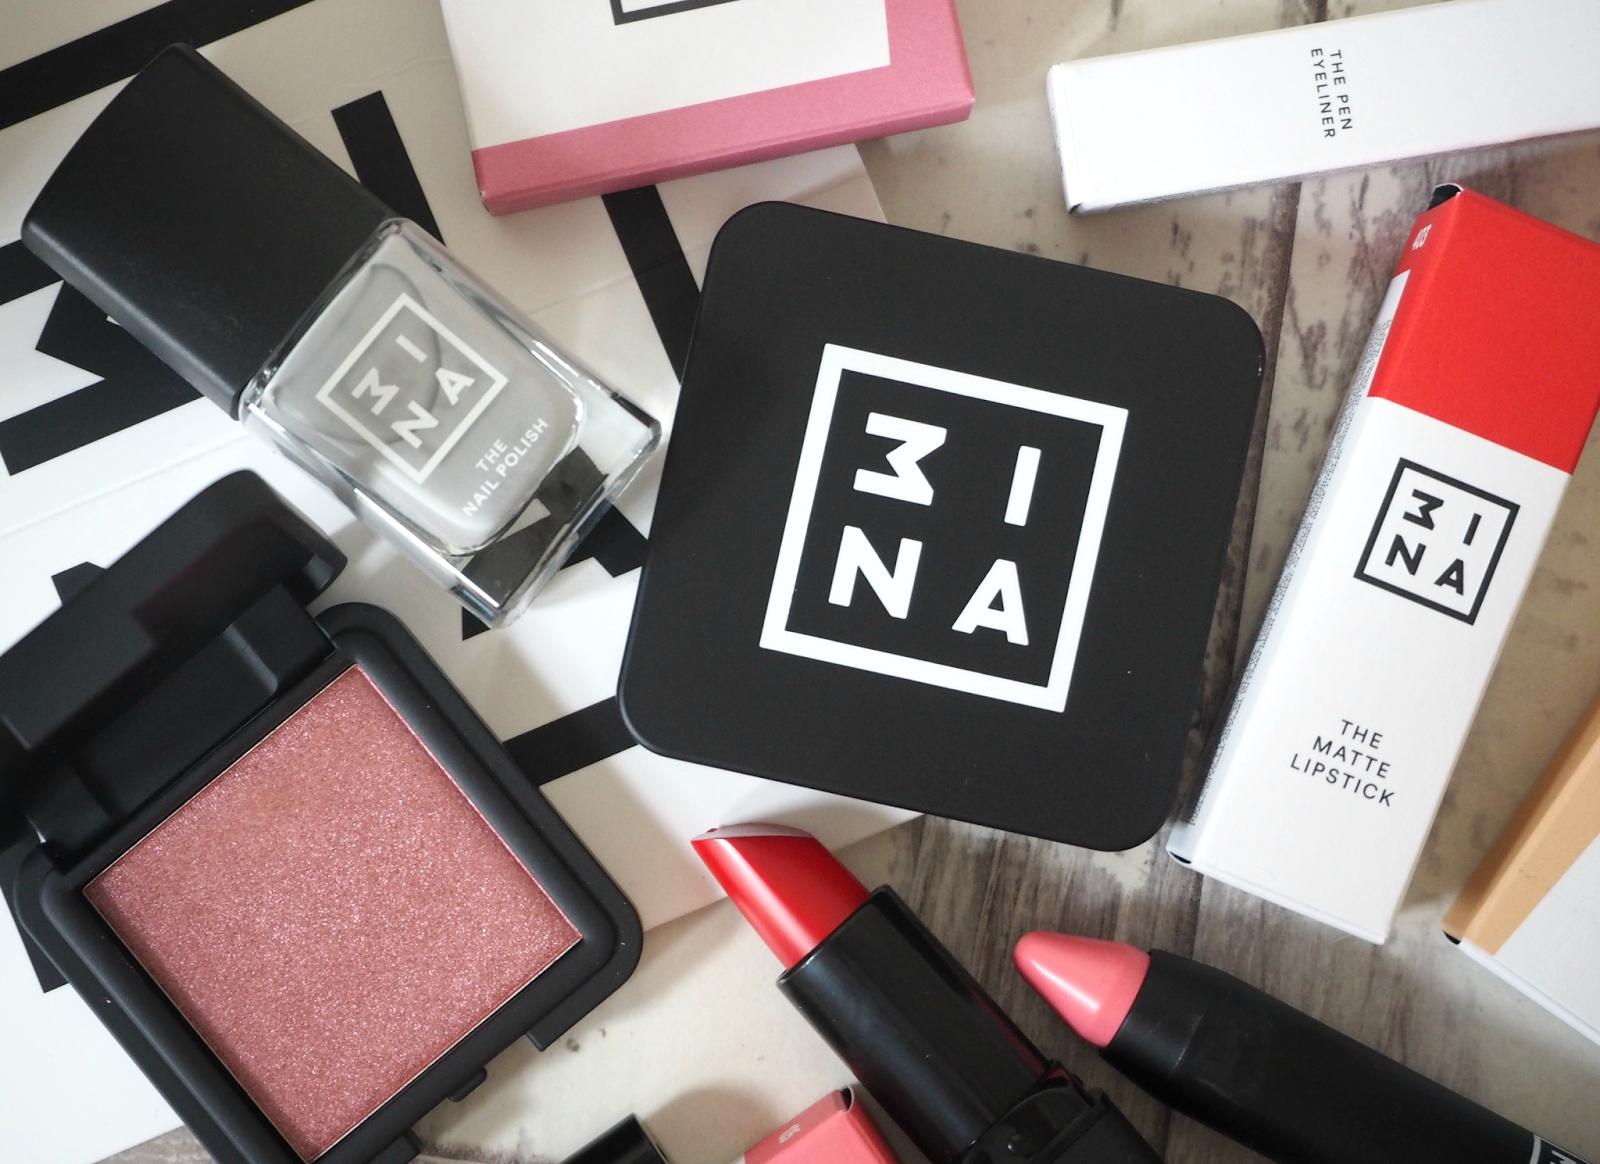 Mina косметика купить найти представителя онлайн магазин эйвон